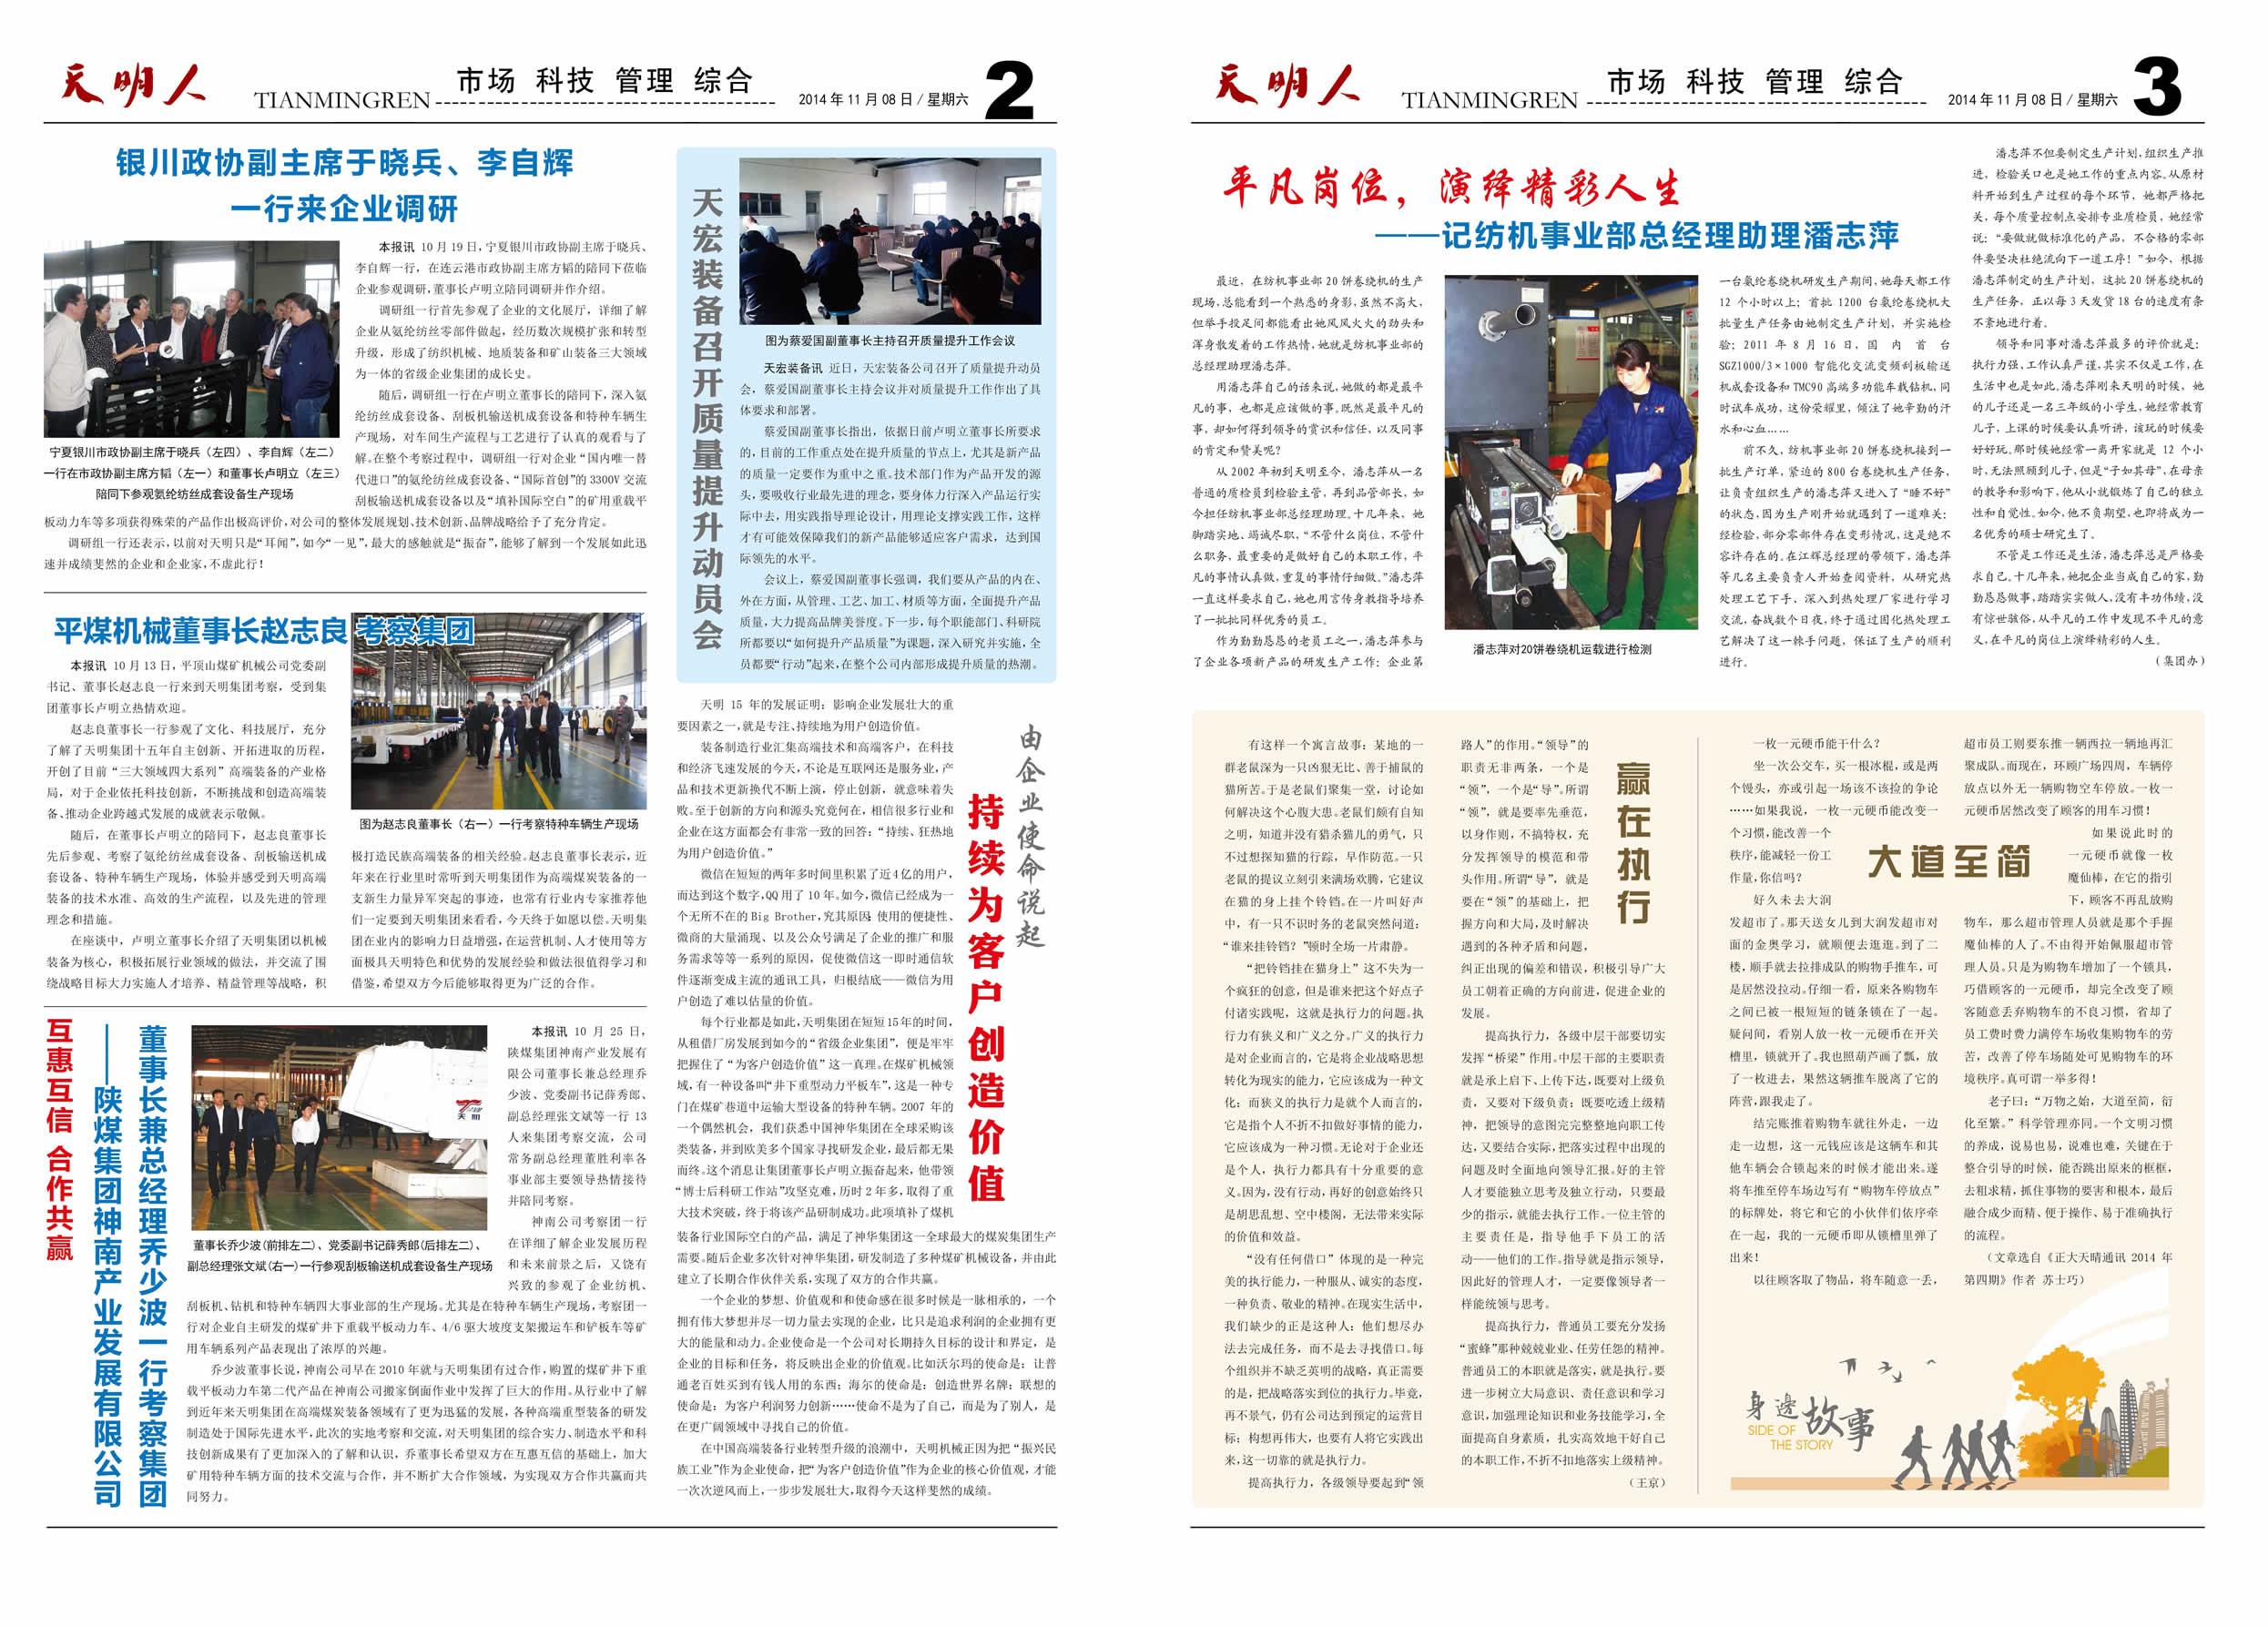 hg711皇冠国际_hg88皇冠国际平台_hg皇冠国际vip首页人2014第11期(总第86期)2、3版